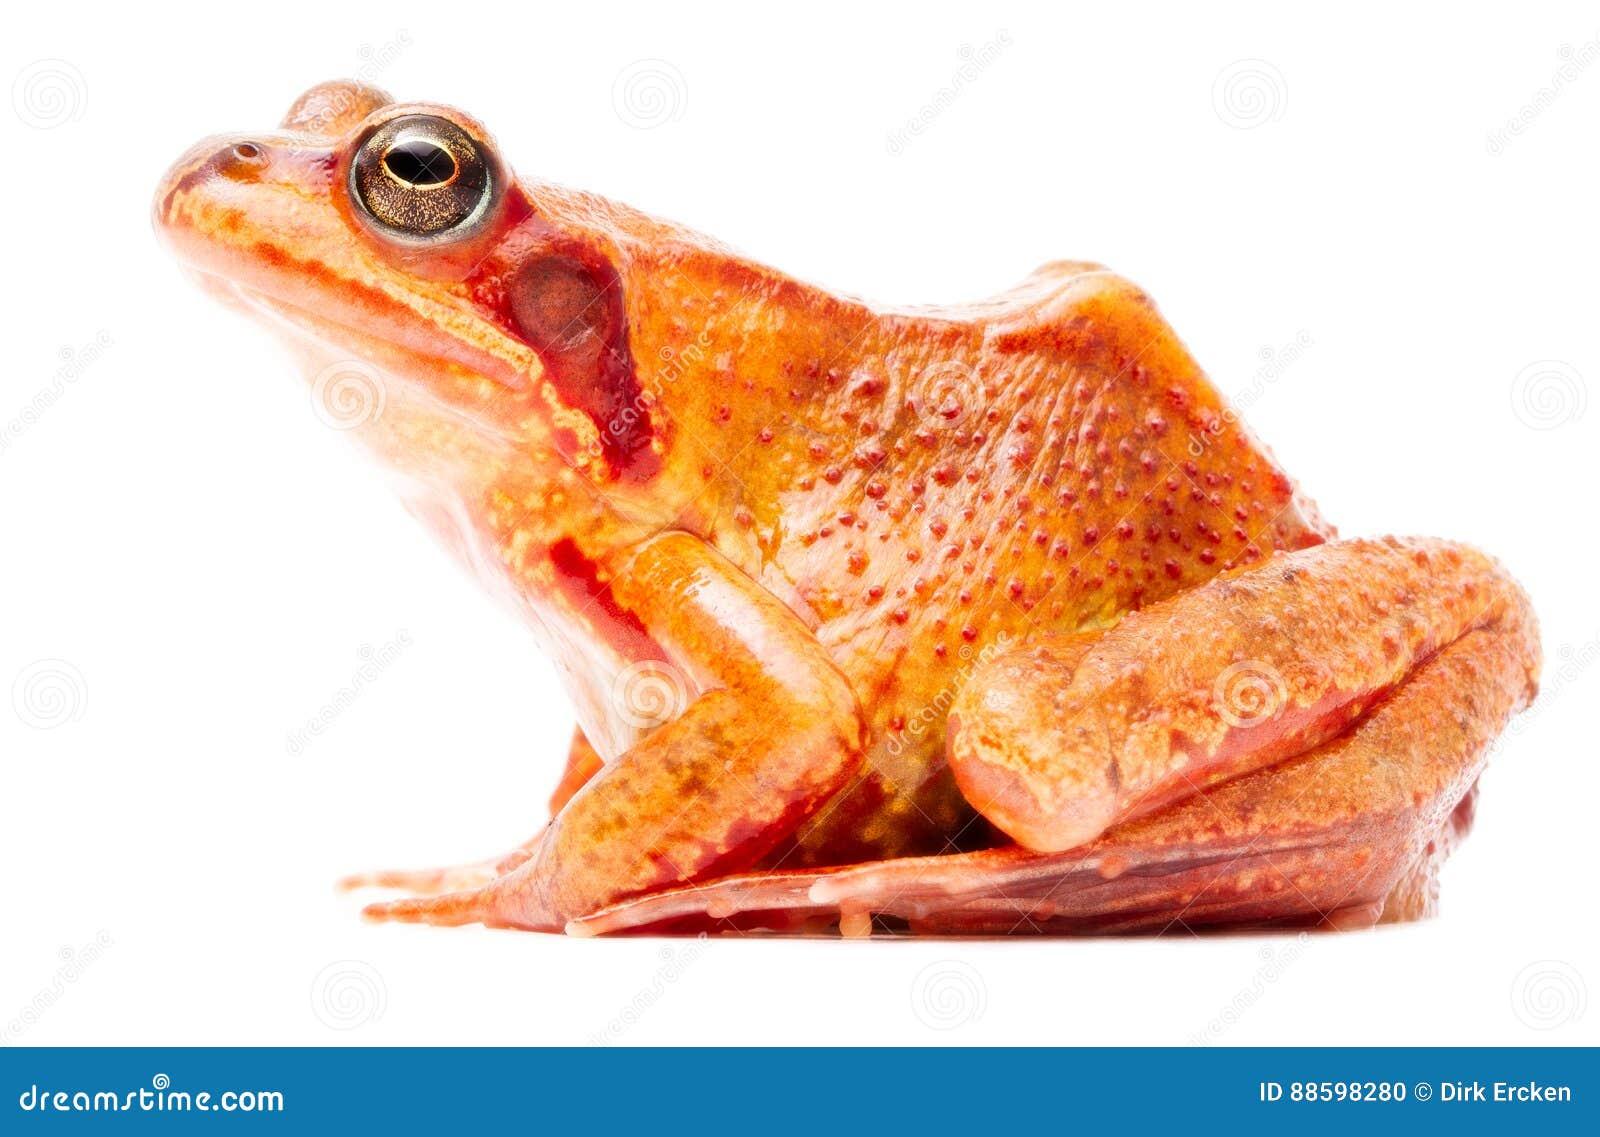 Common brown grass frog Rana temporaria